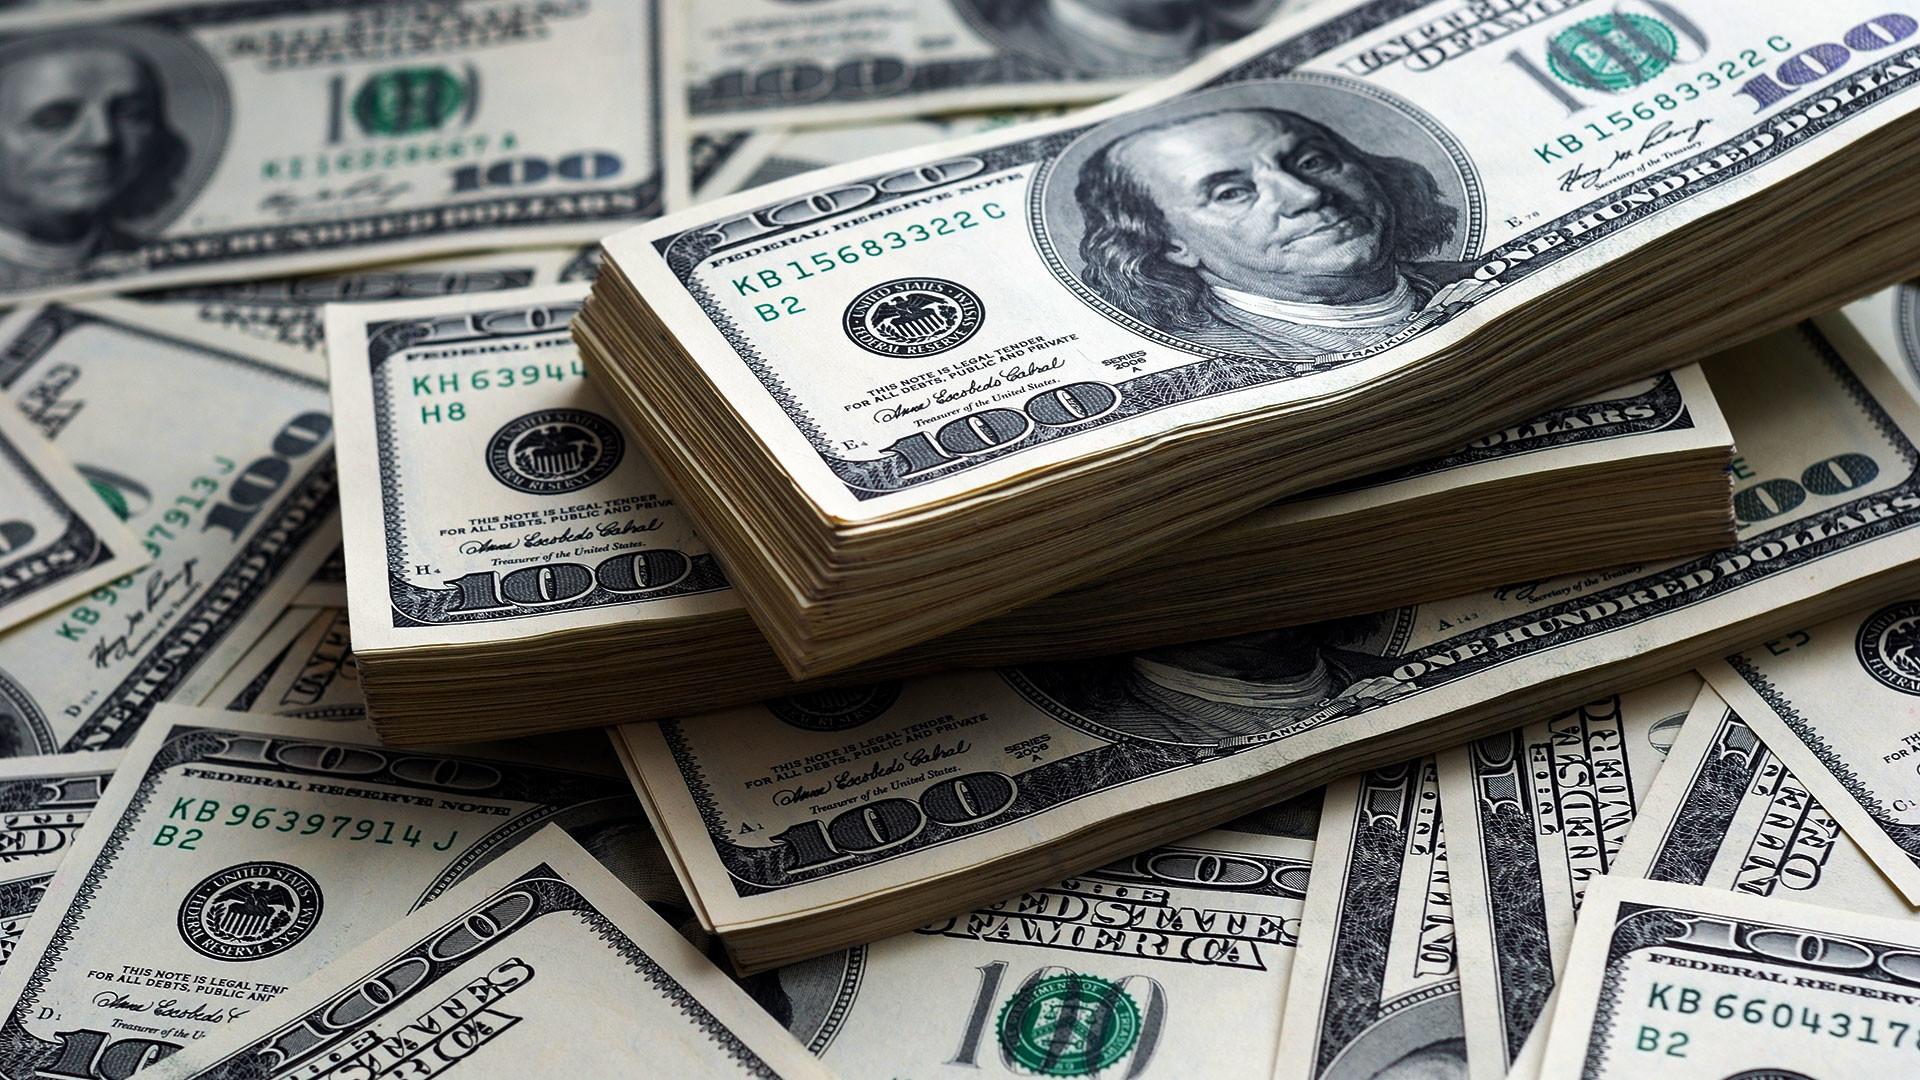 Live Wallpaper Money Falling Cash Money Wallpaper 67 Images